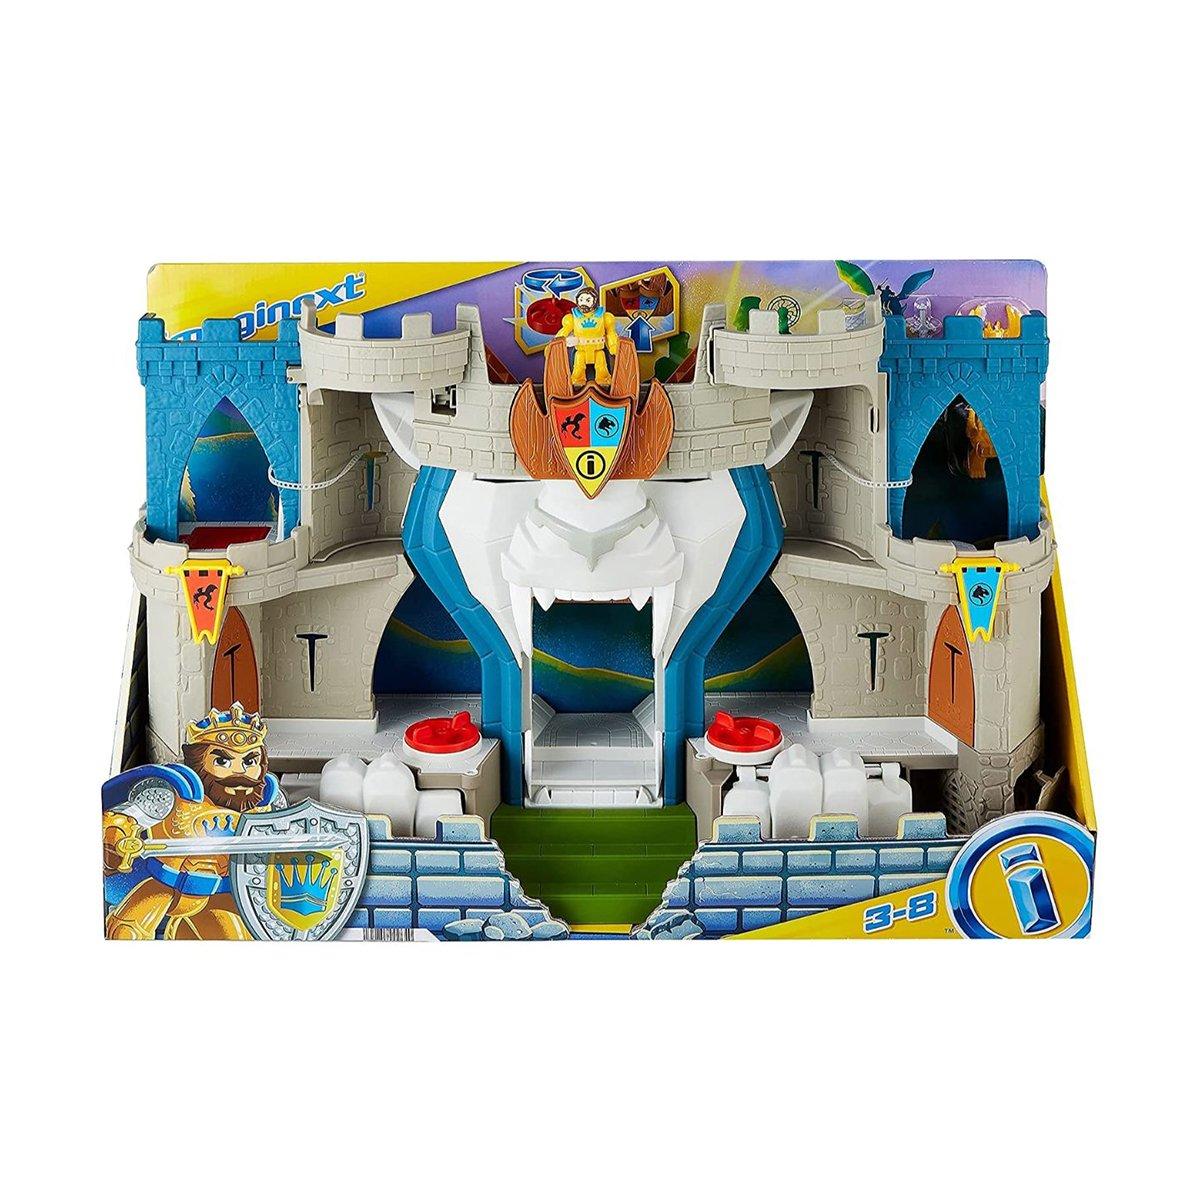 Set de joaca Imaginext, Castel